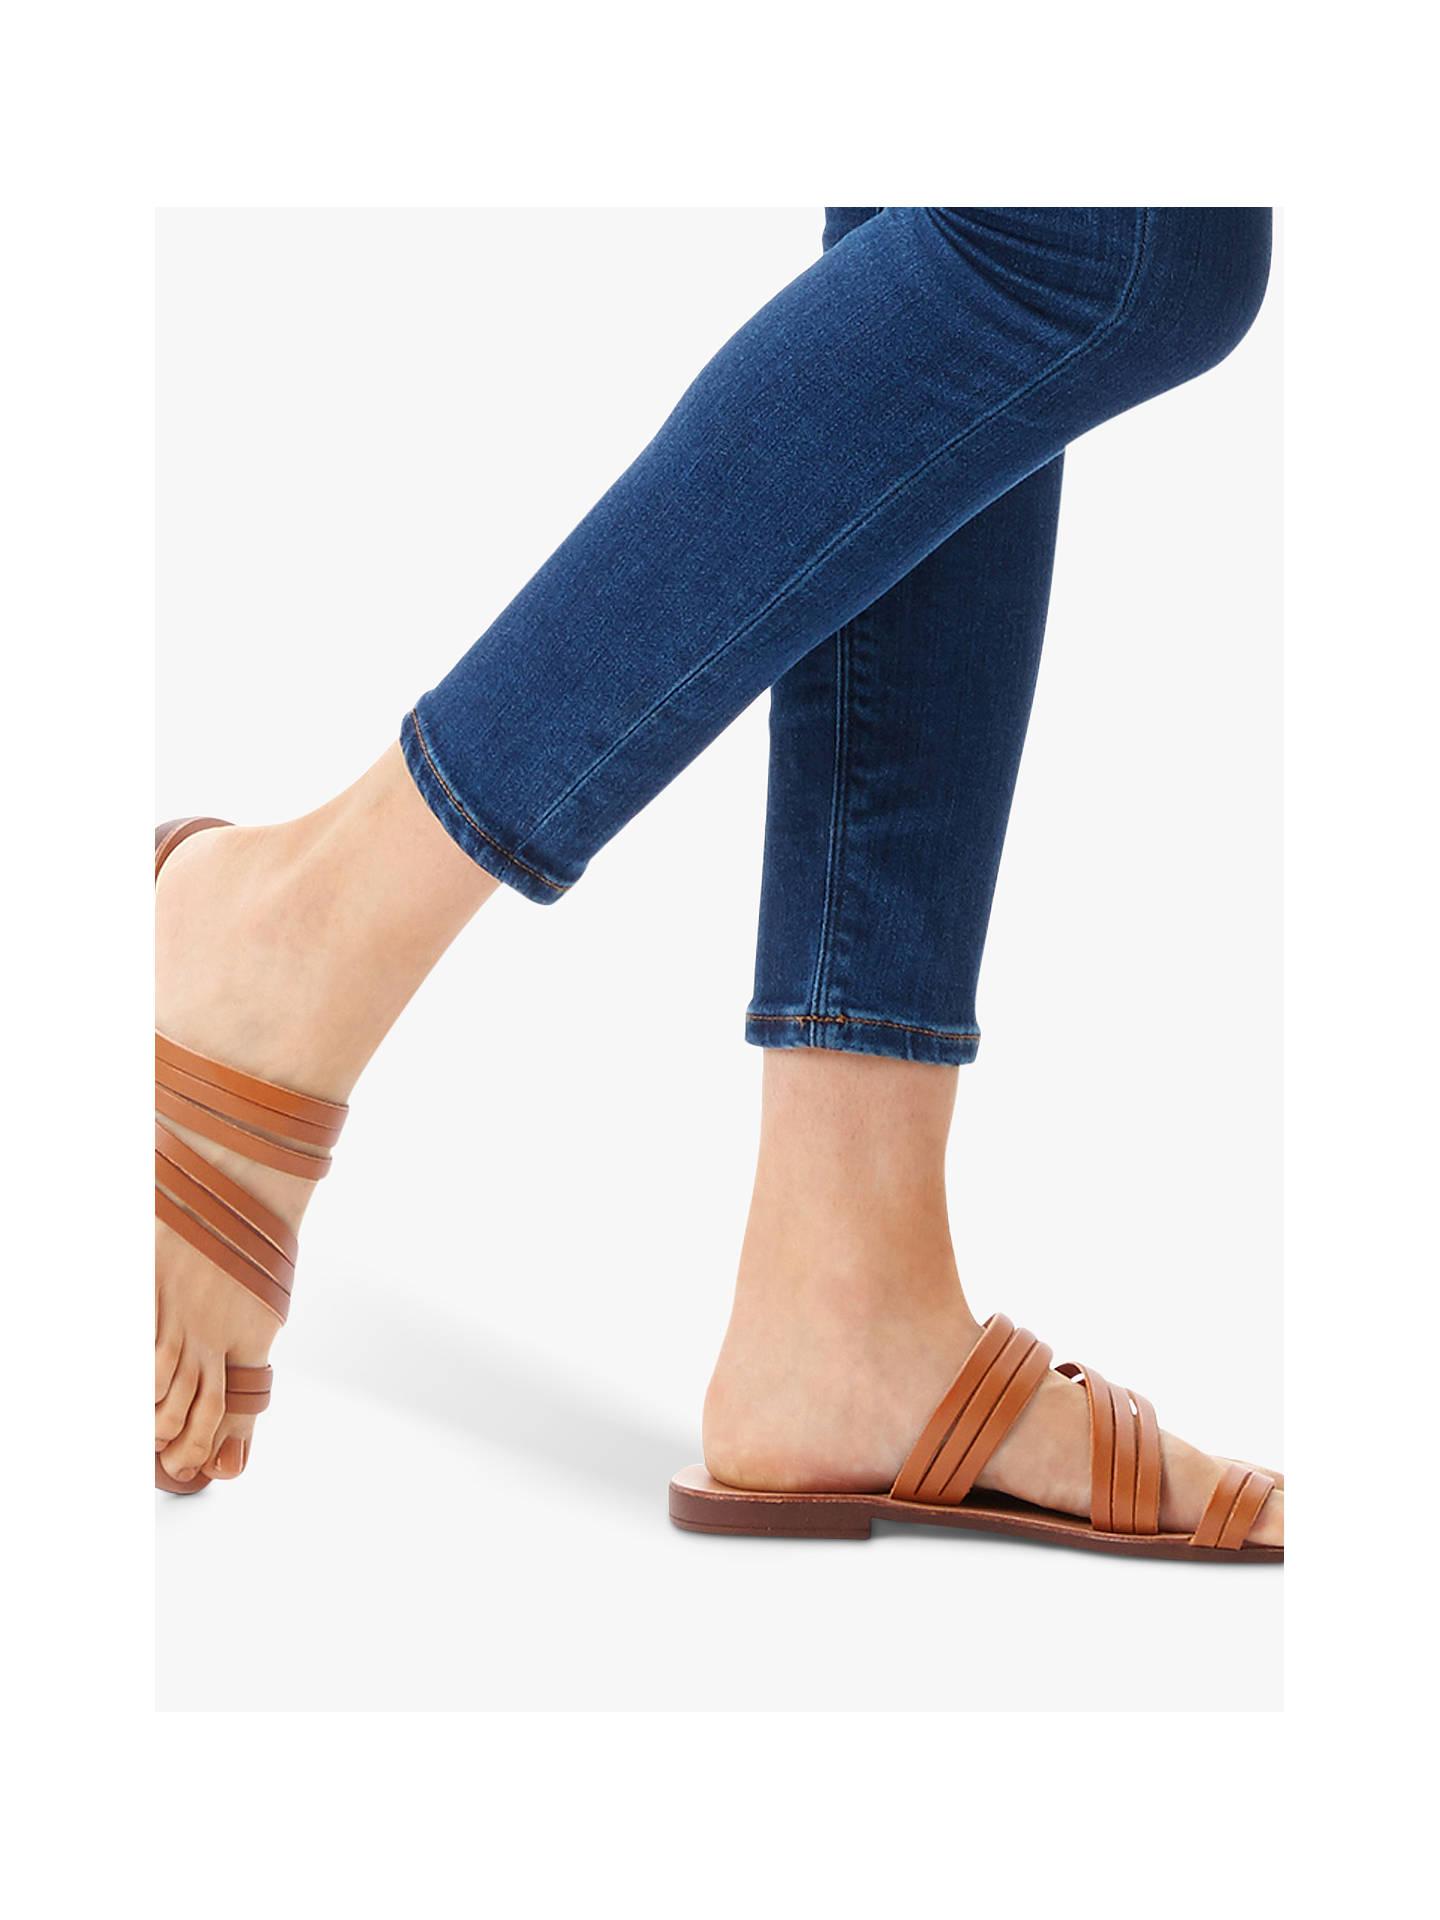 6da0d3cf2b4b Kurt Geiger London Deliah Multi Strap Flat Sandals at John Lewis ...